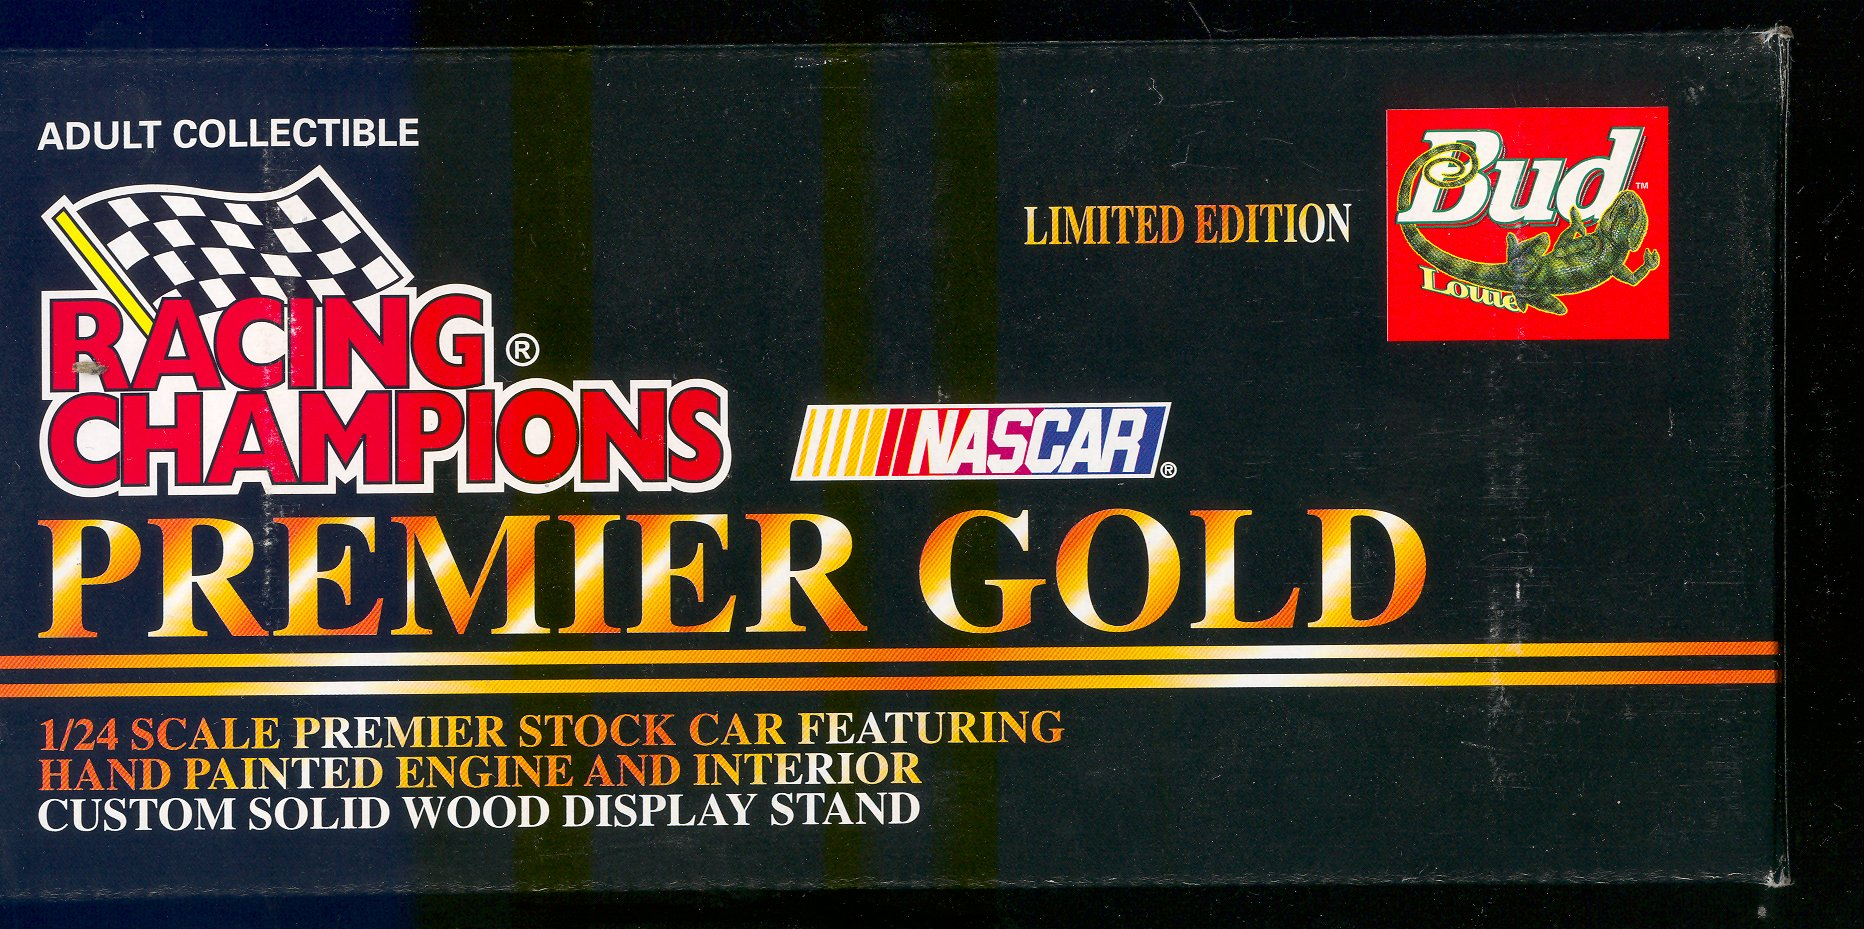 1997 Racing Champions 1:24 #25 R.Craven/Bud Lizard